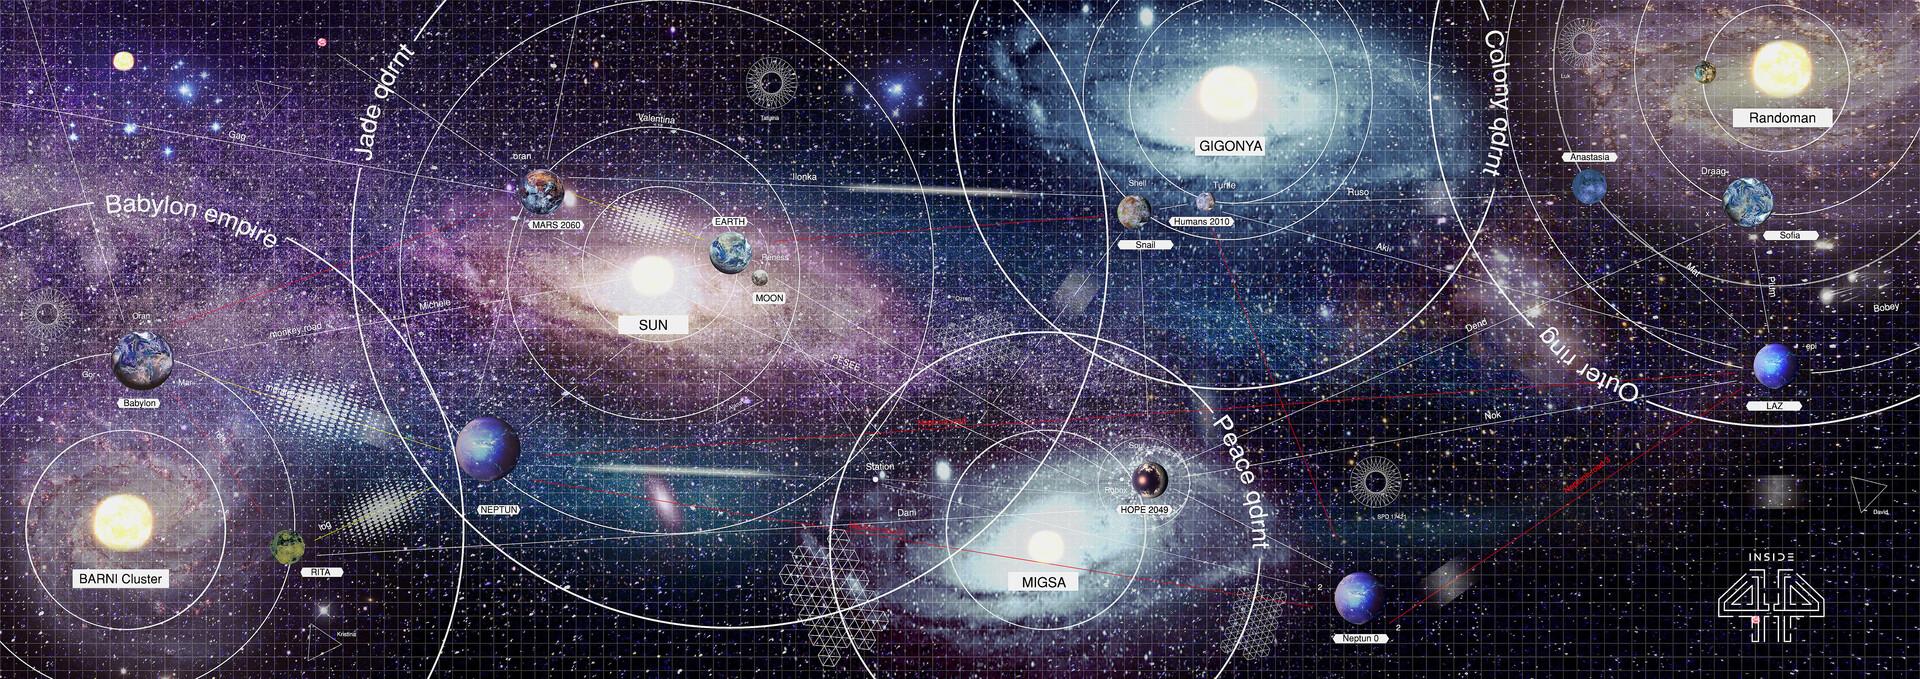 INSIDE 44 universe map